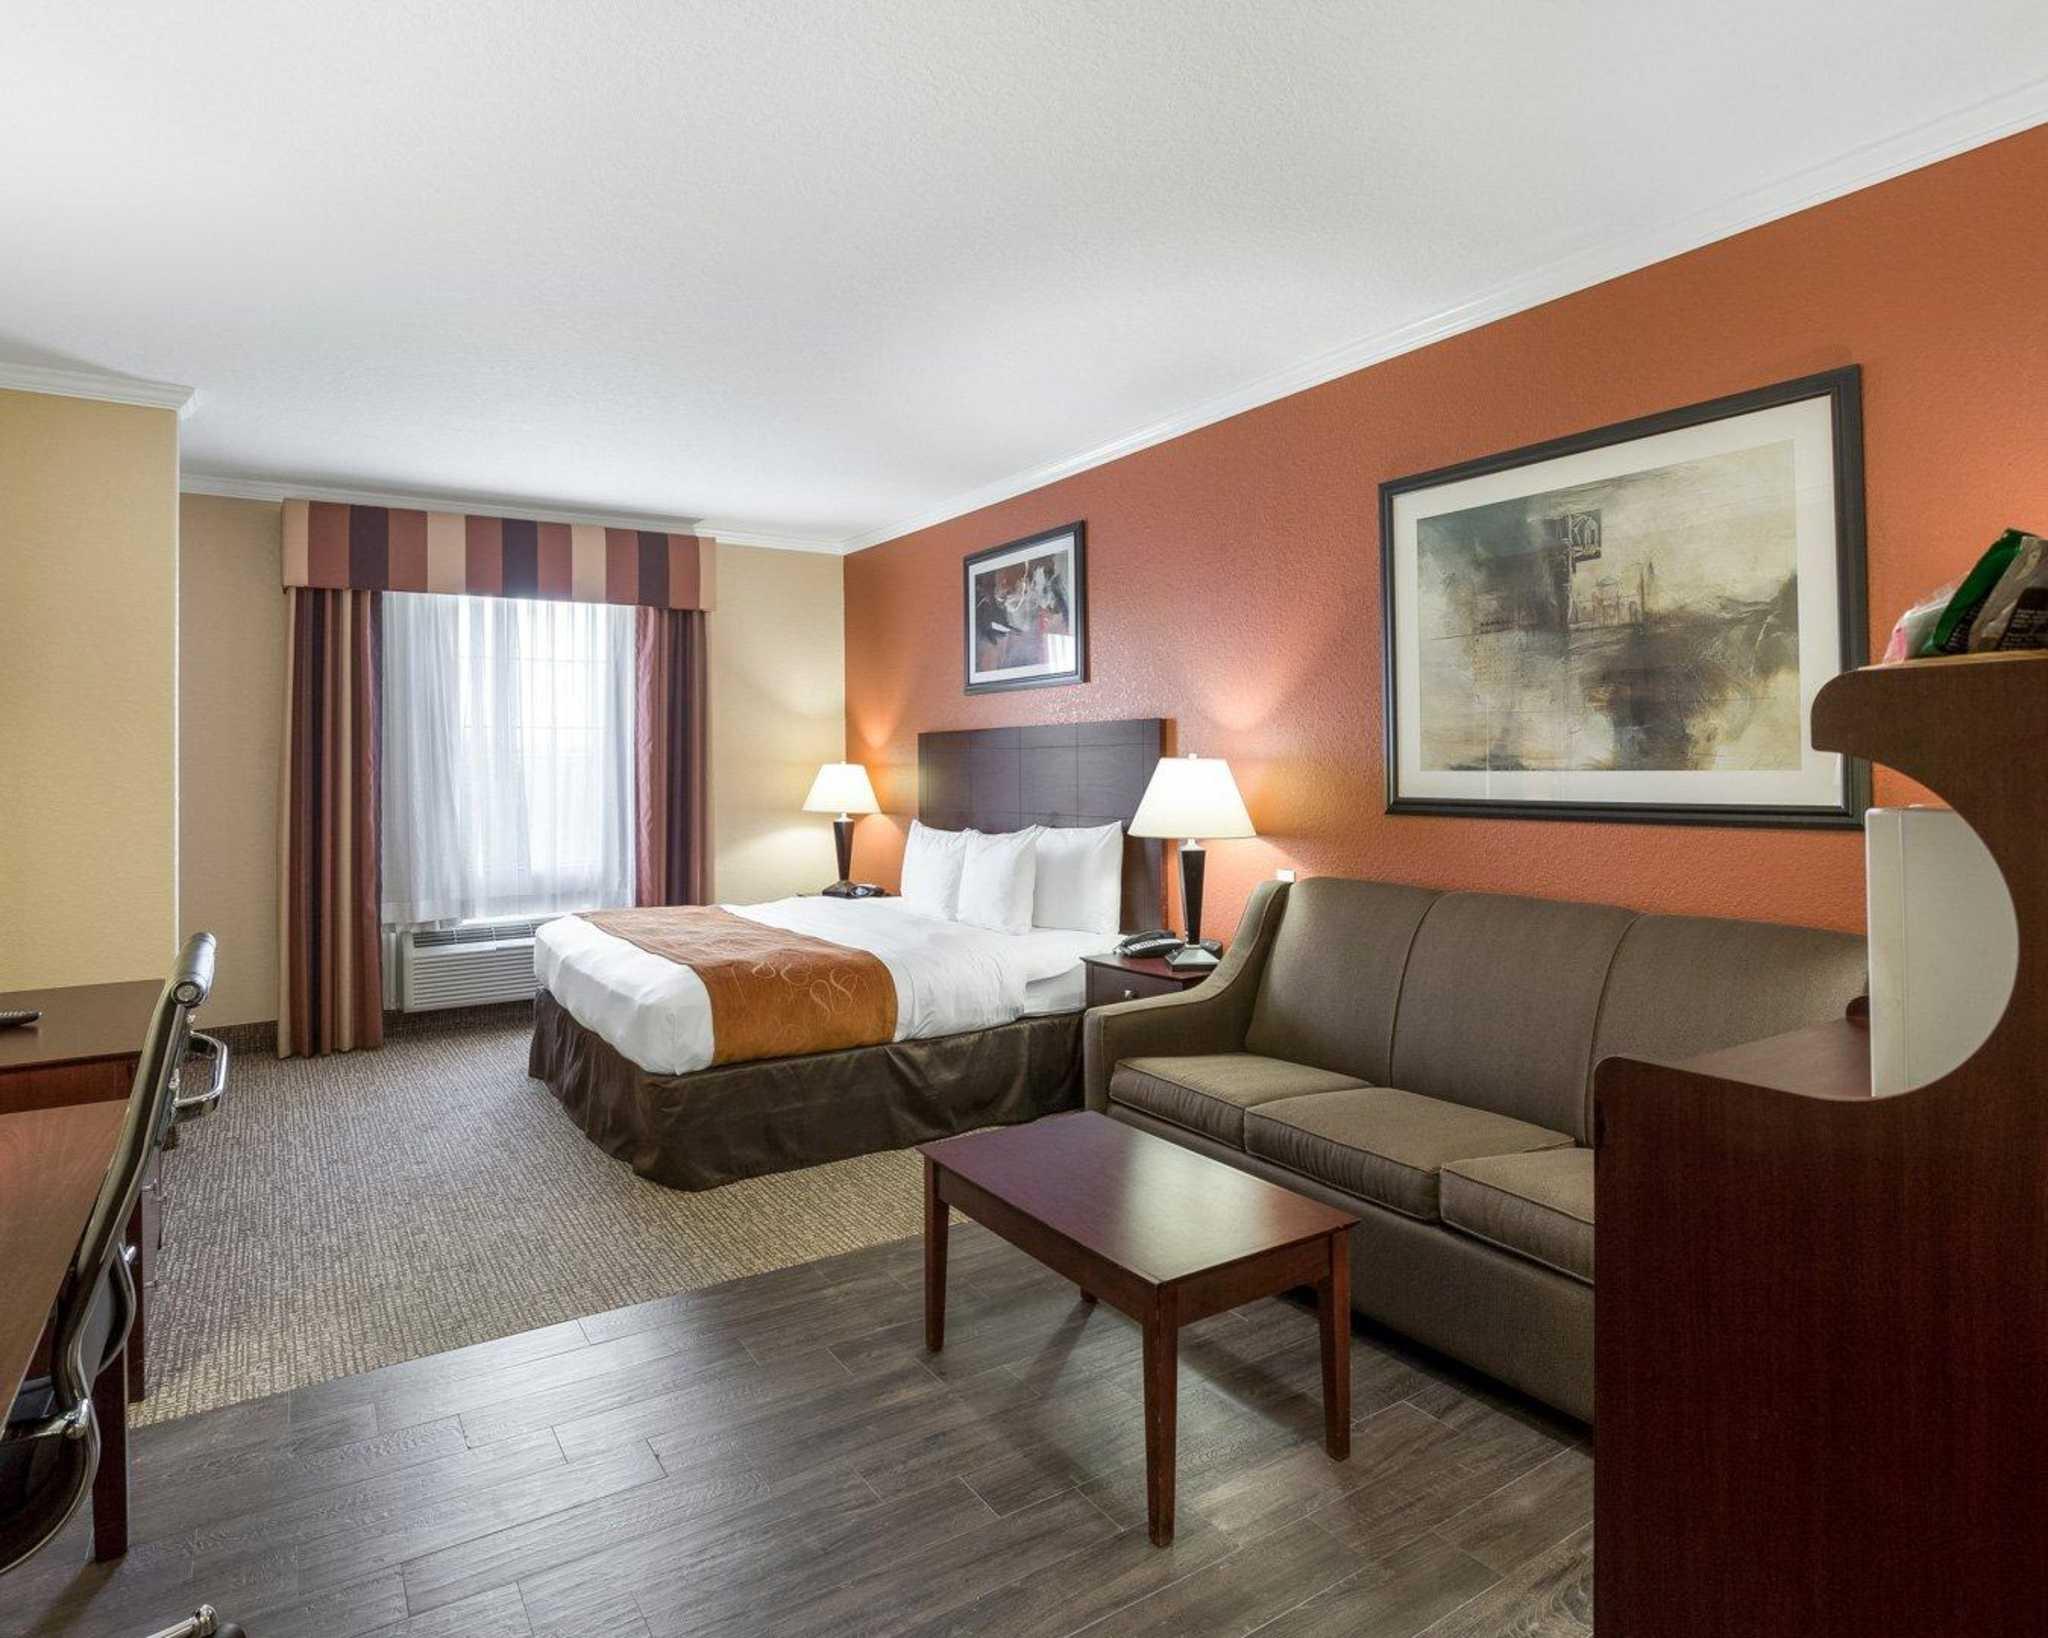 Comfort Suites image 51